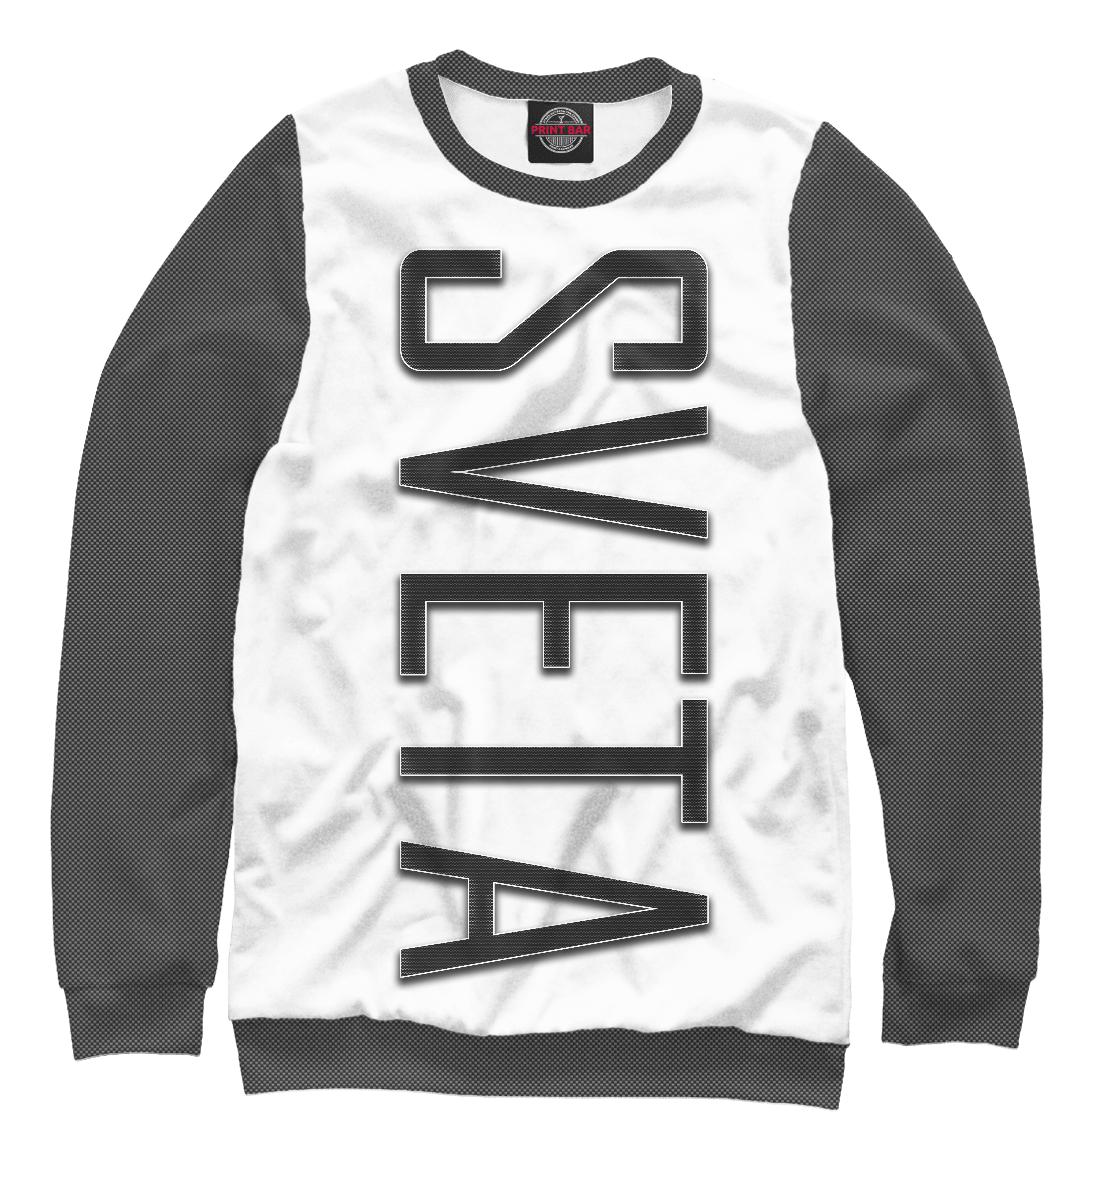 Купить Sveta-carbon, Printbar, Свитшоты, IMR-689896-swi-2